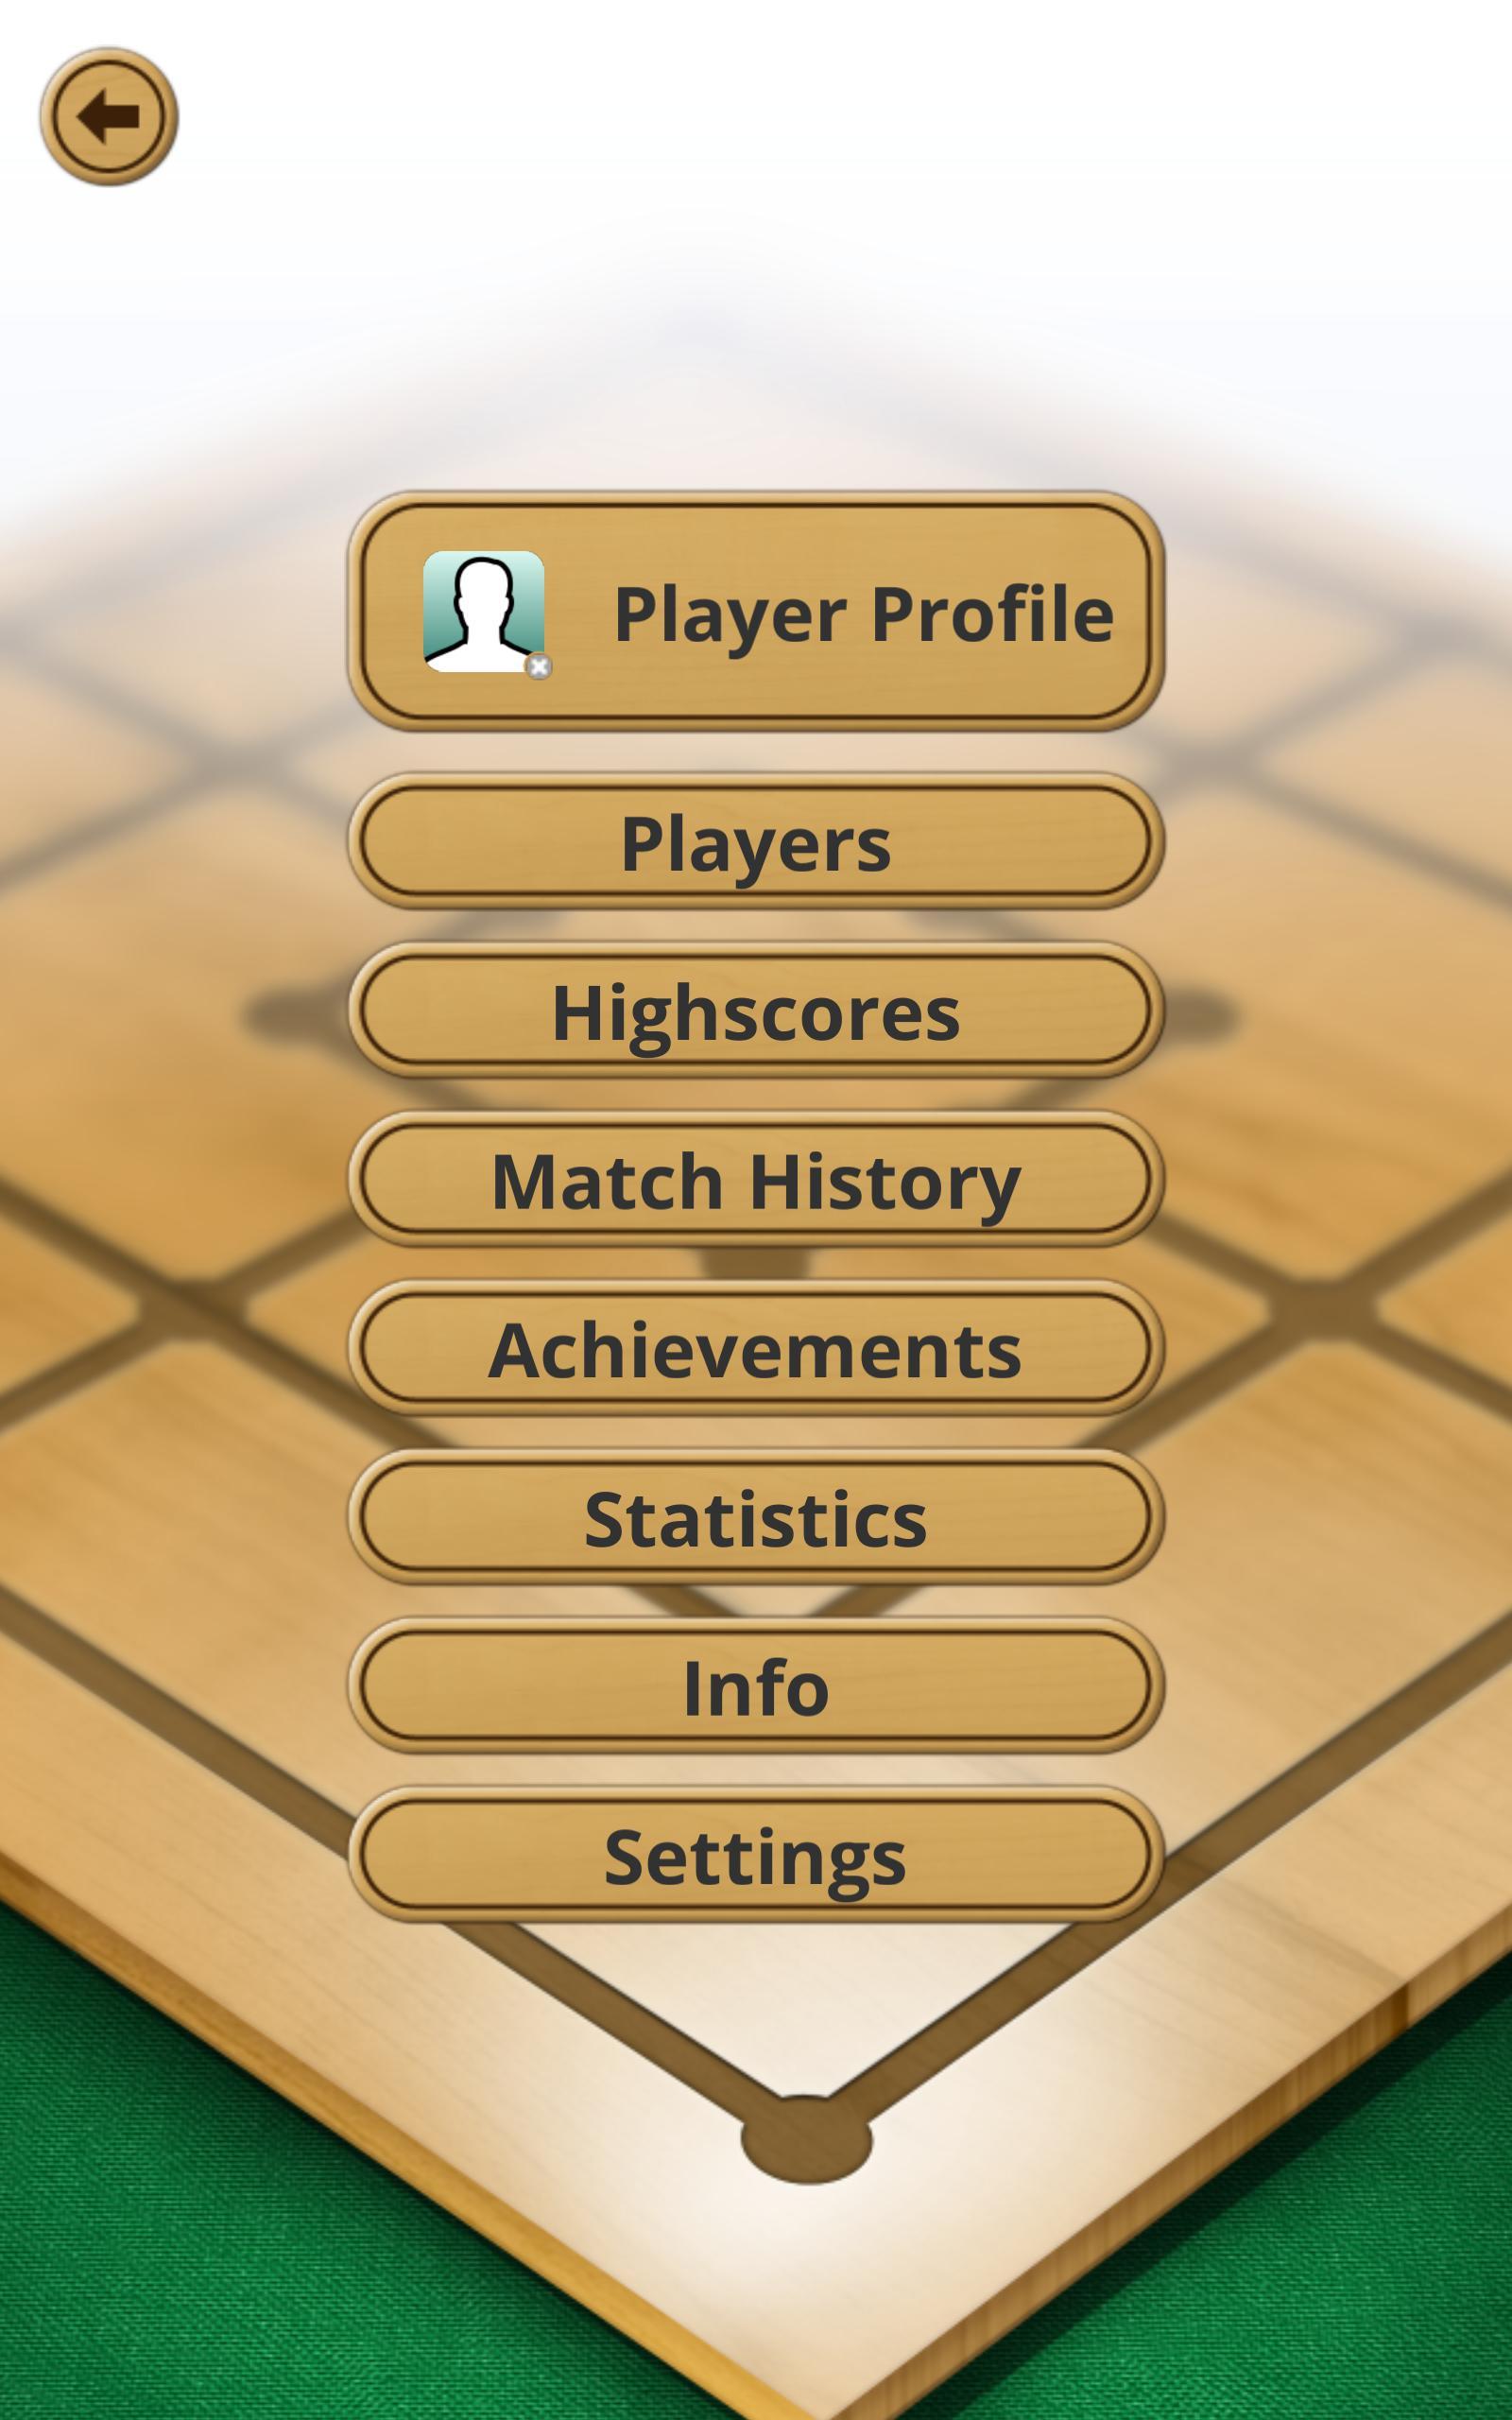 Nine men's Morris - Mills - Free online board game 2.8.11 Screenshot 10